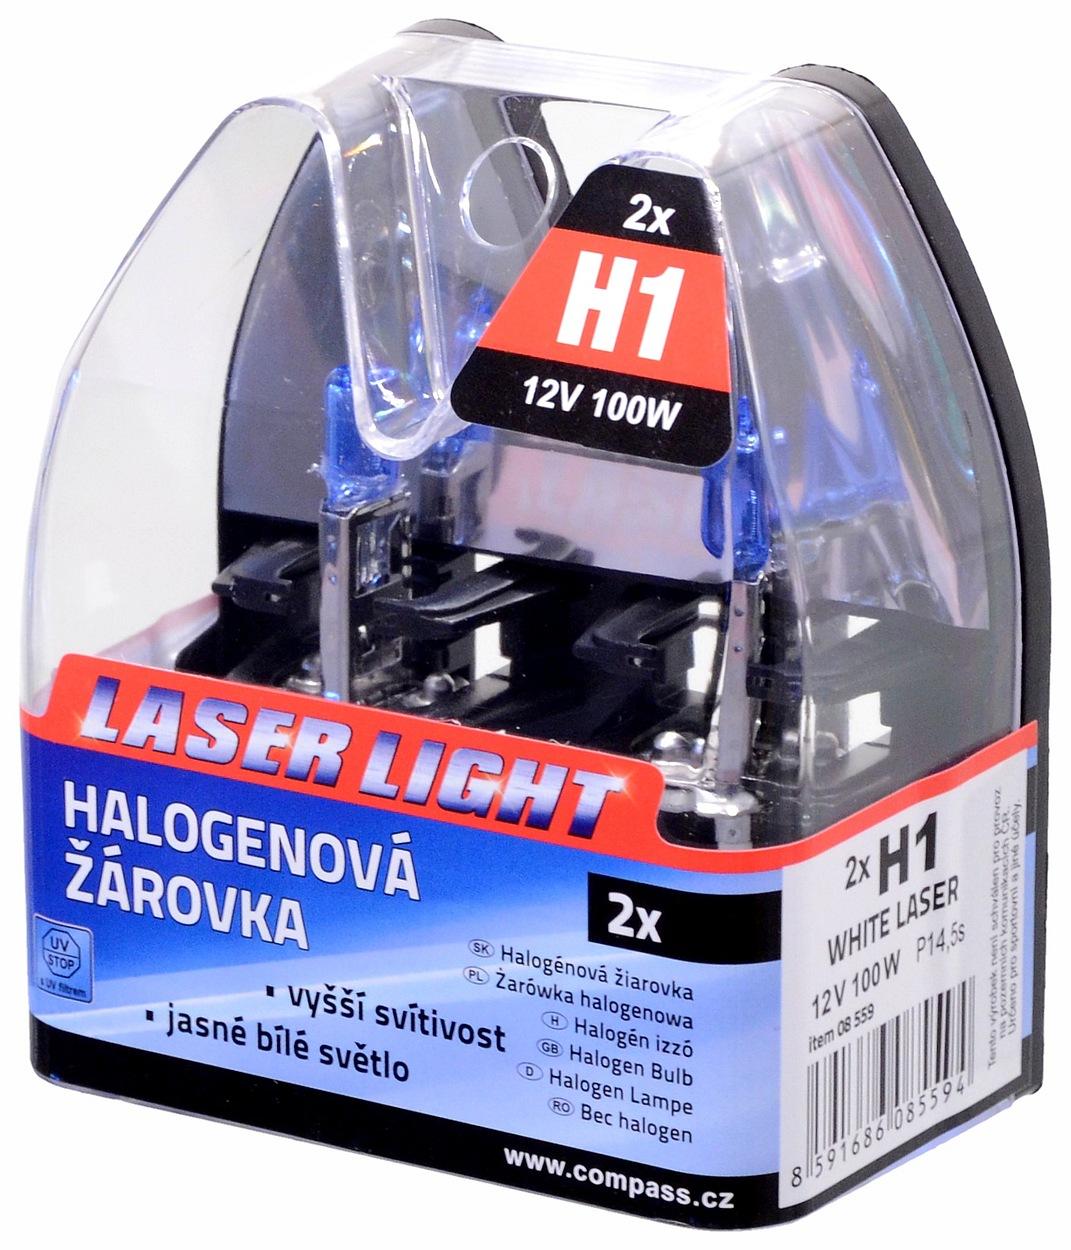 Compass Žárovka 12V H1 100W P14,5s WHITE LASER 2ks